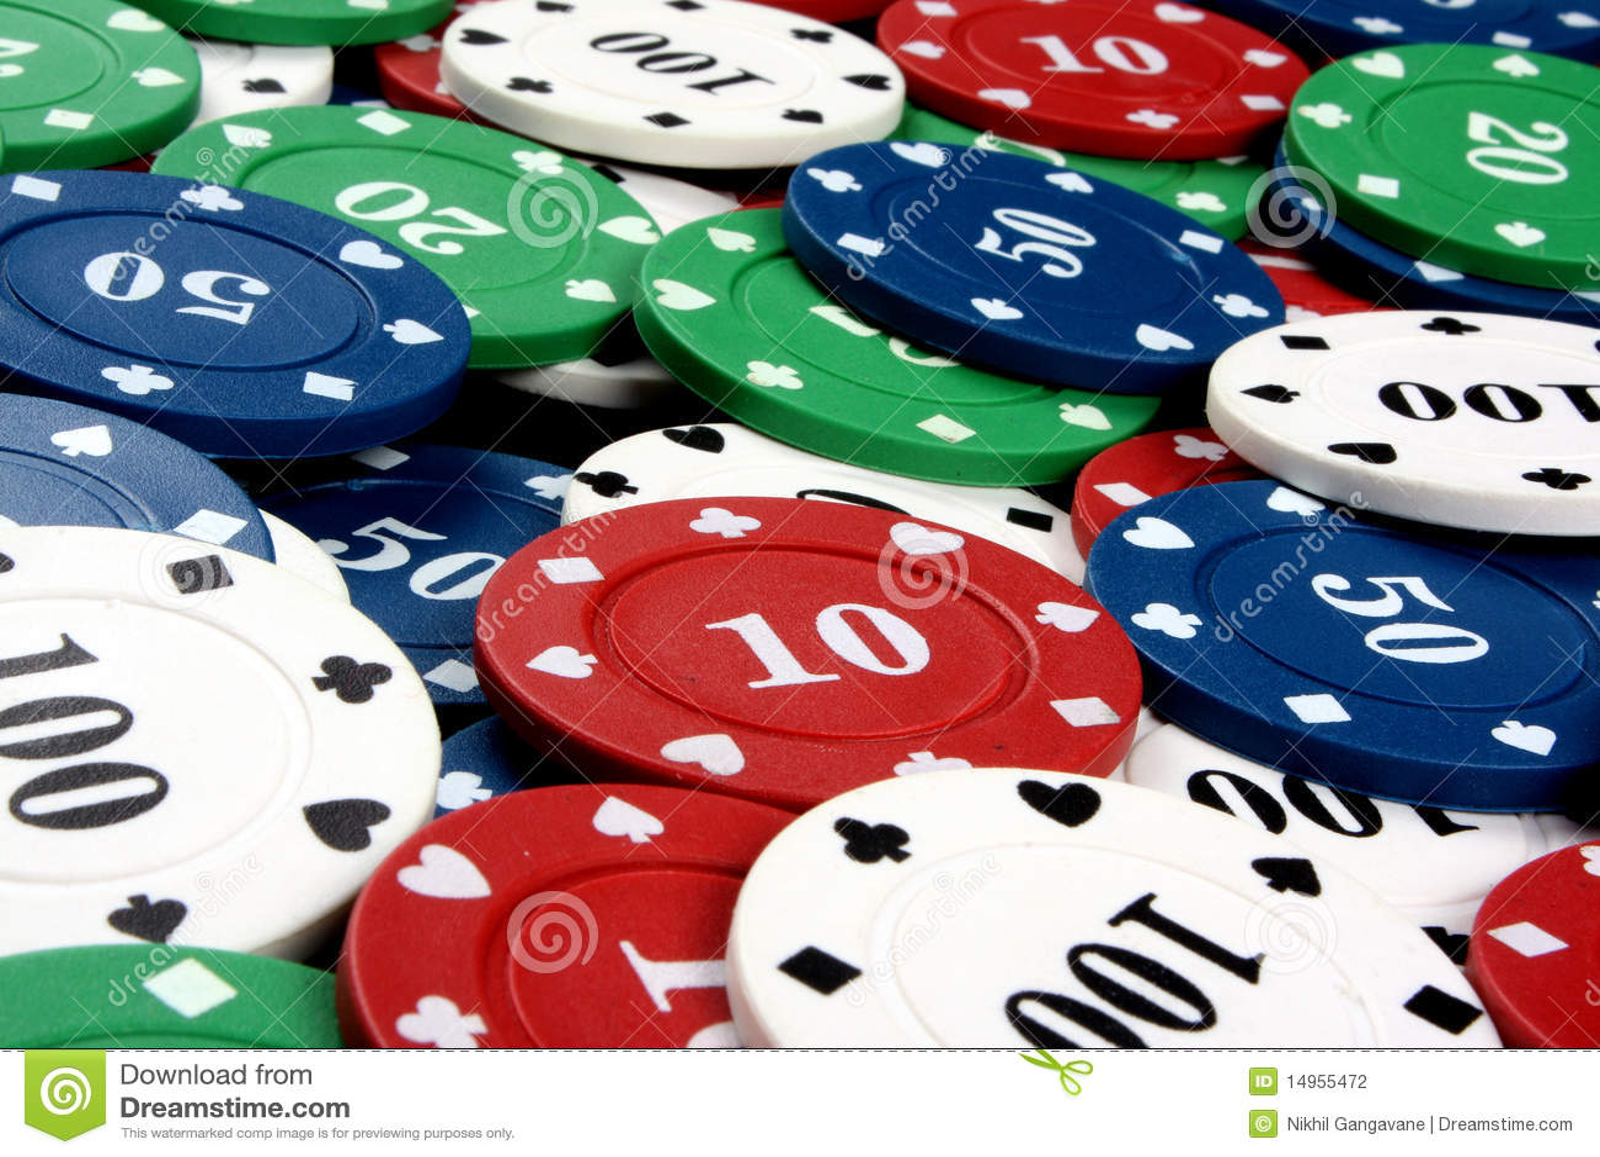 Gambling counters is internet gambling legal in us